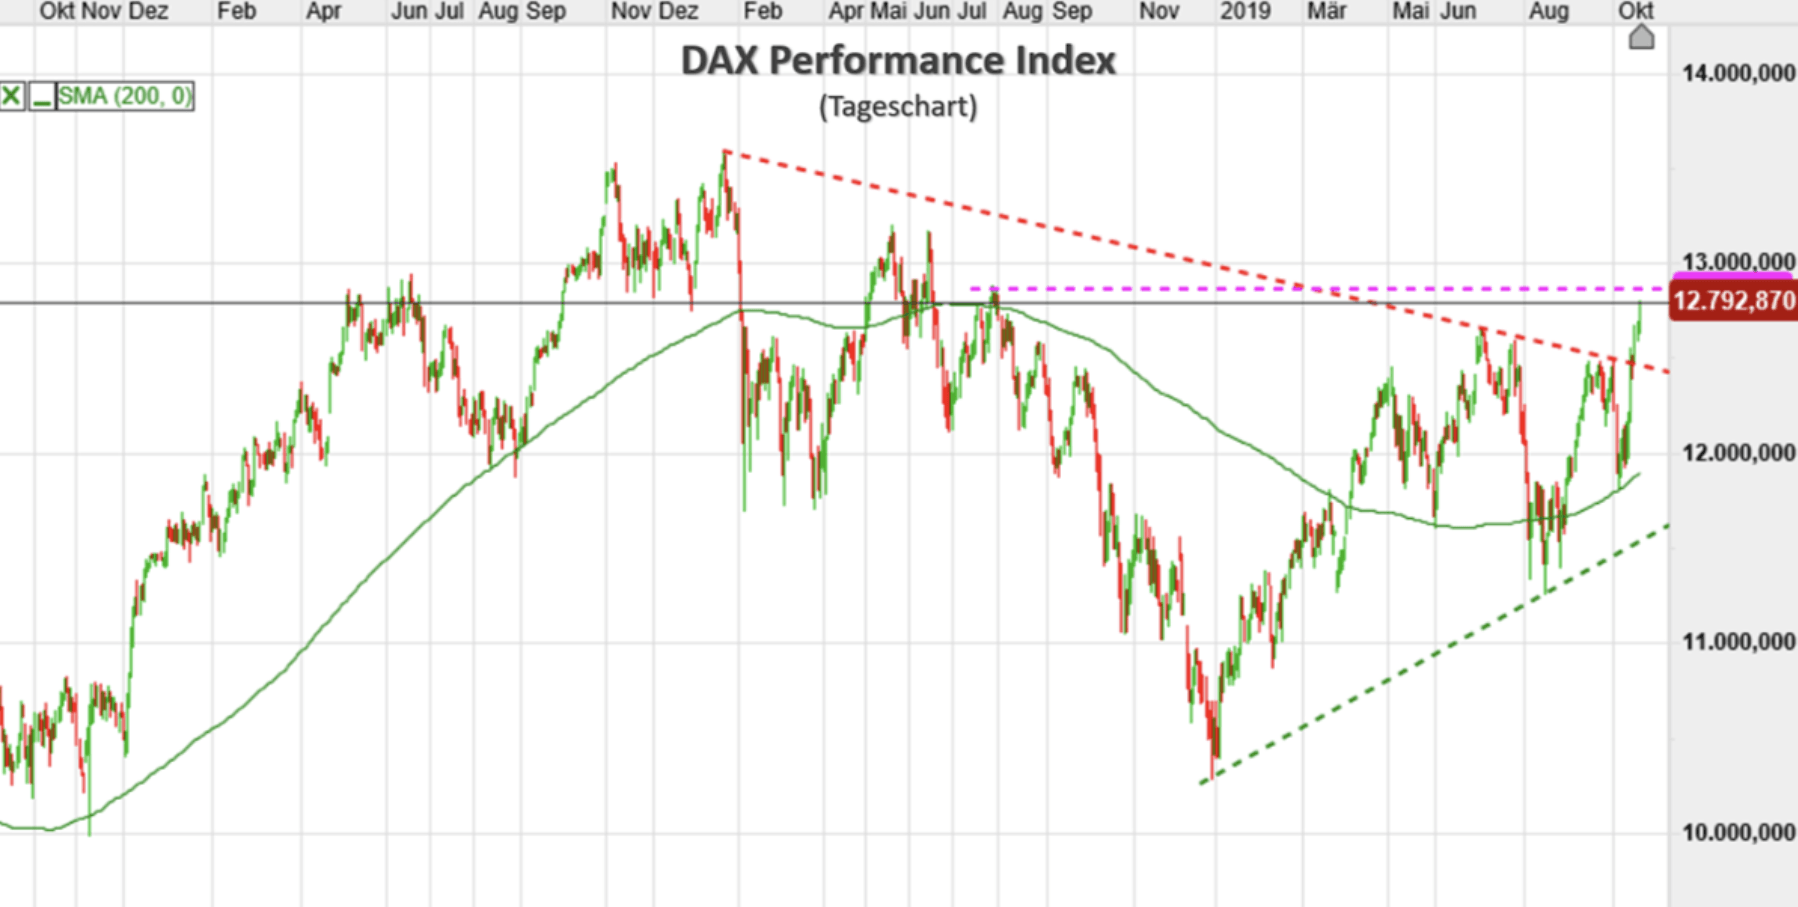 Dax Kursverlauf langfristig